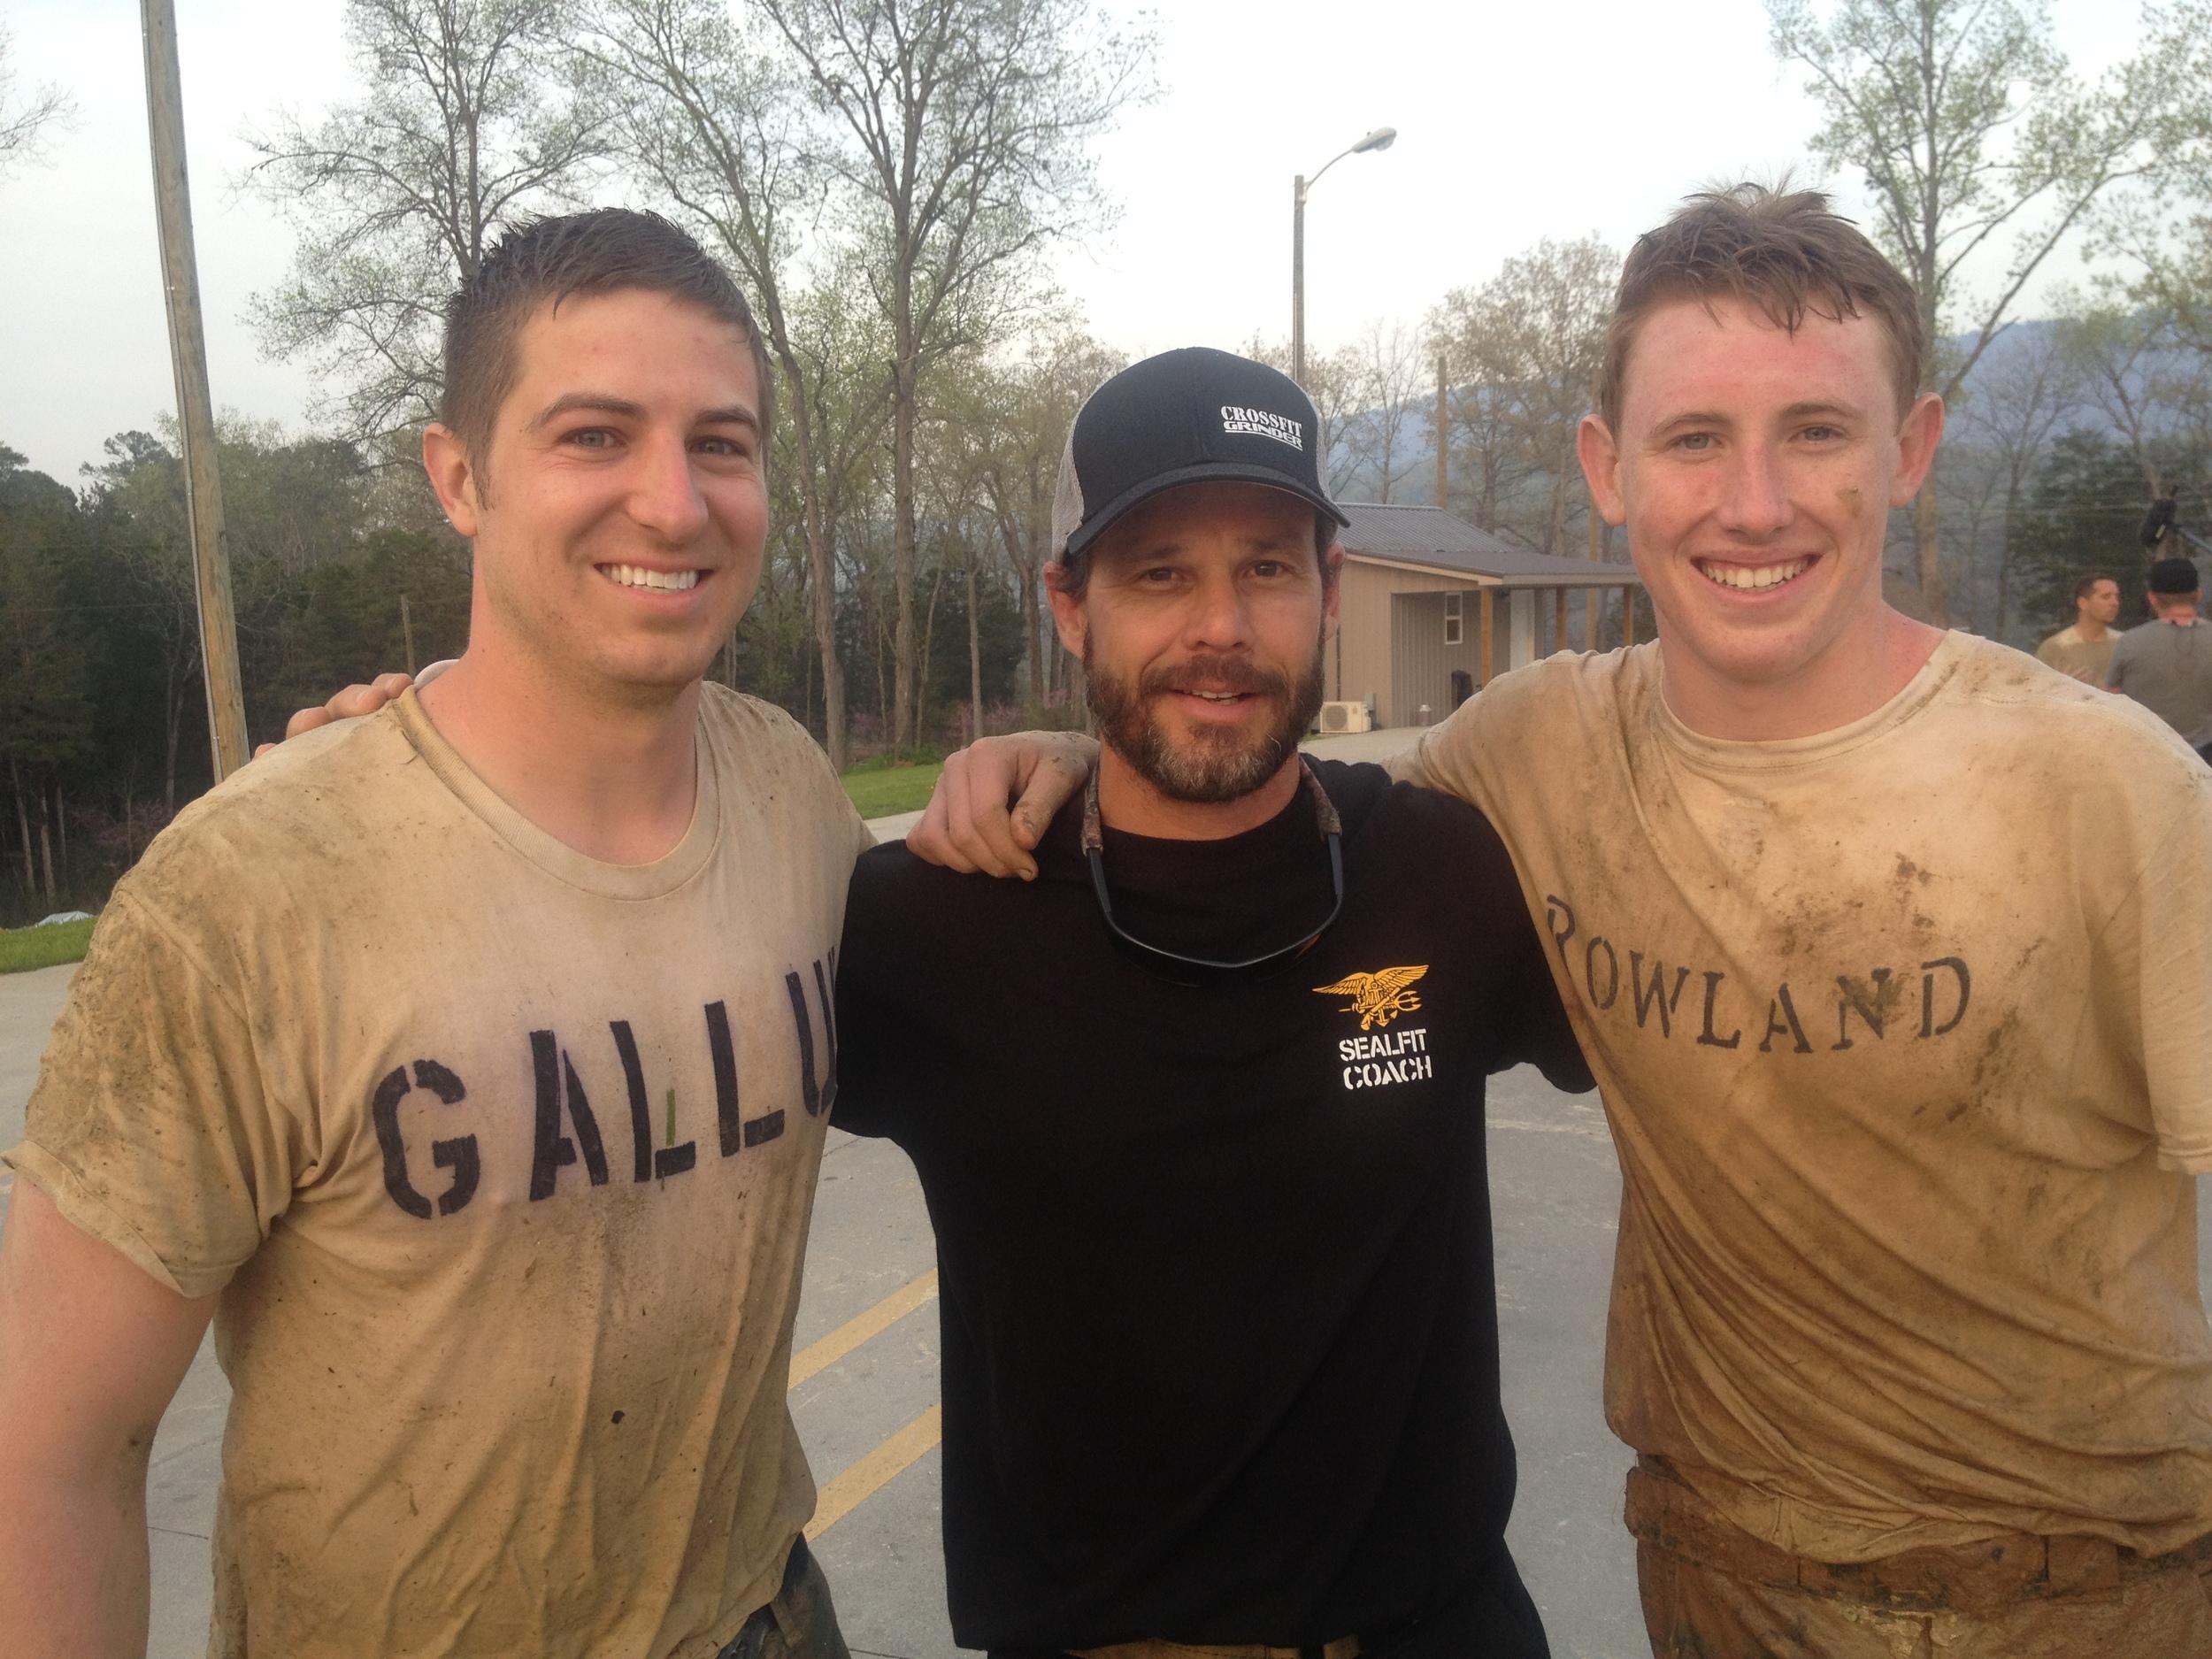 Jordan with Brad McLeod and Turner Rowland celebrating a successful finish